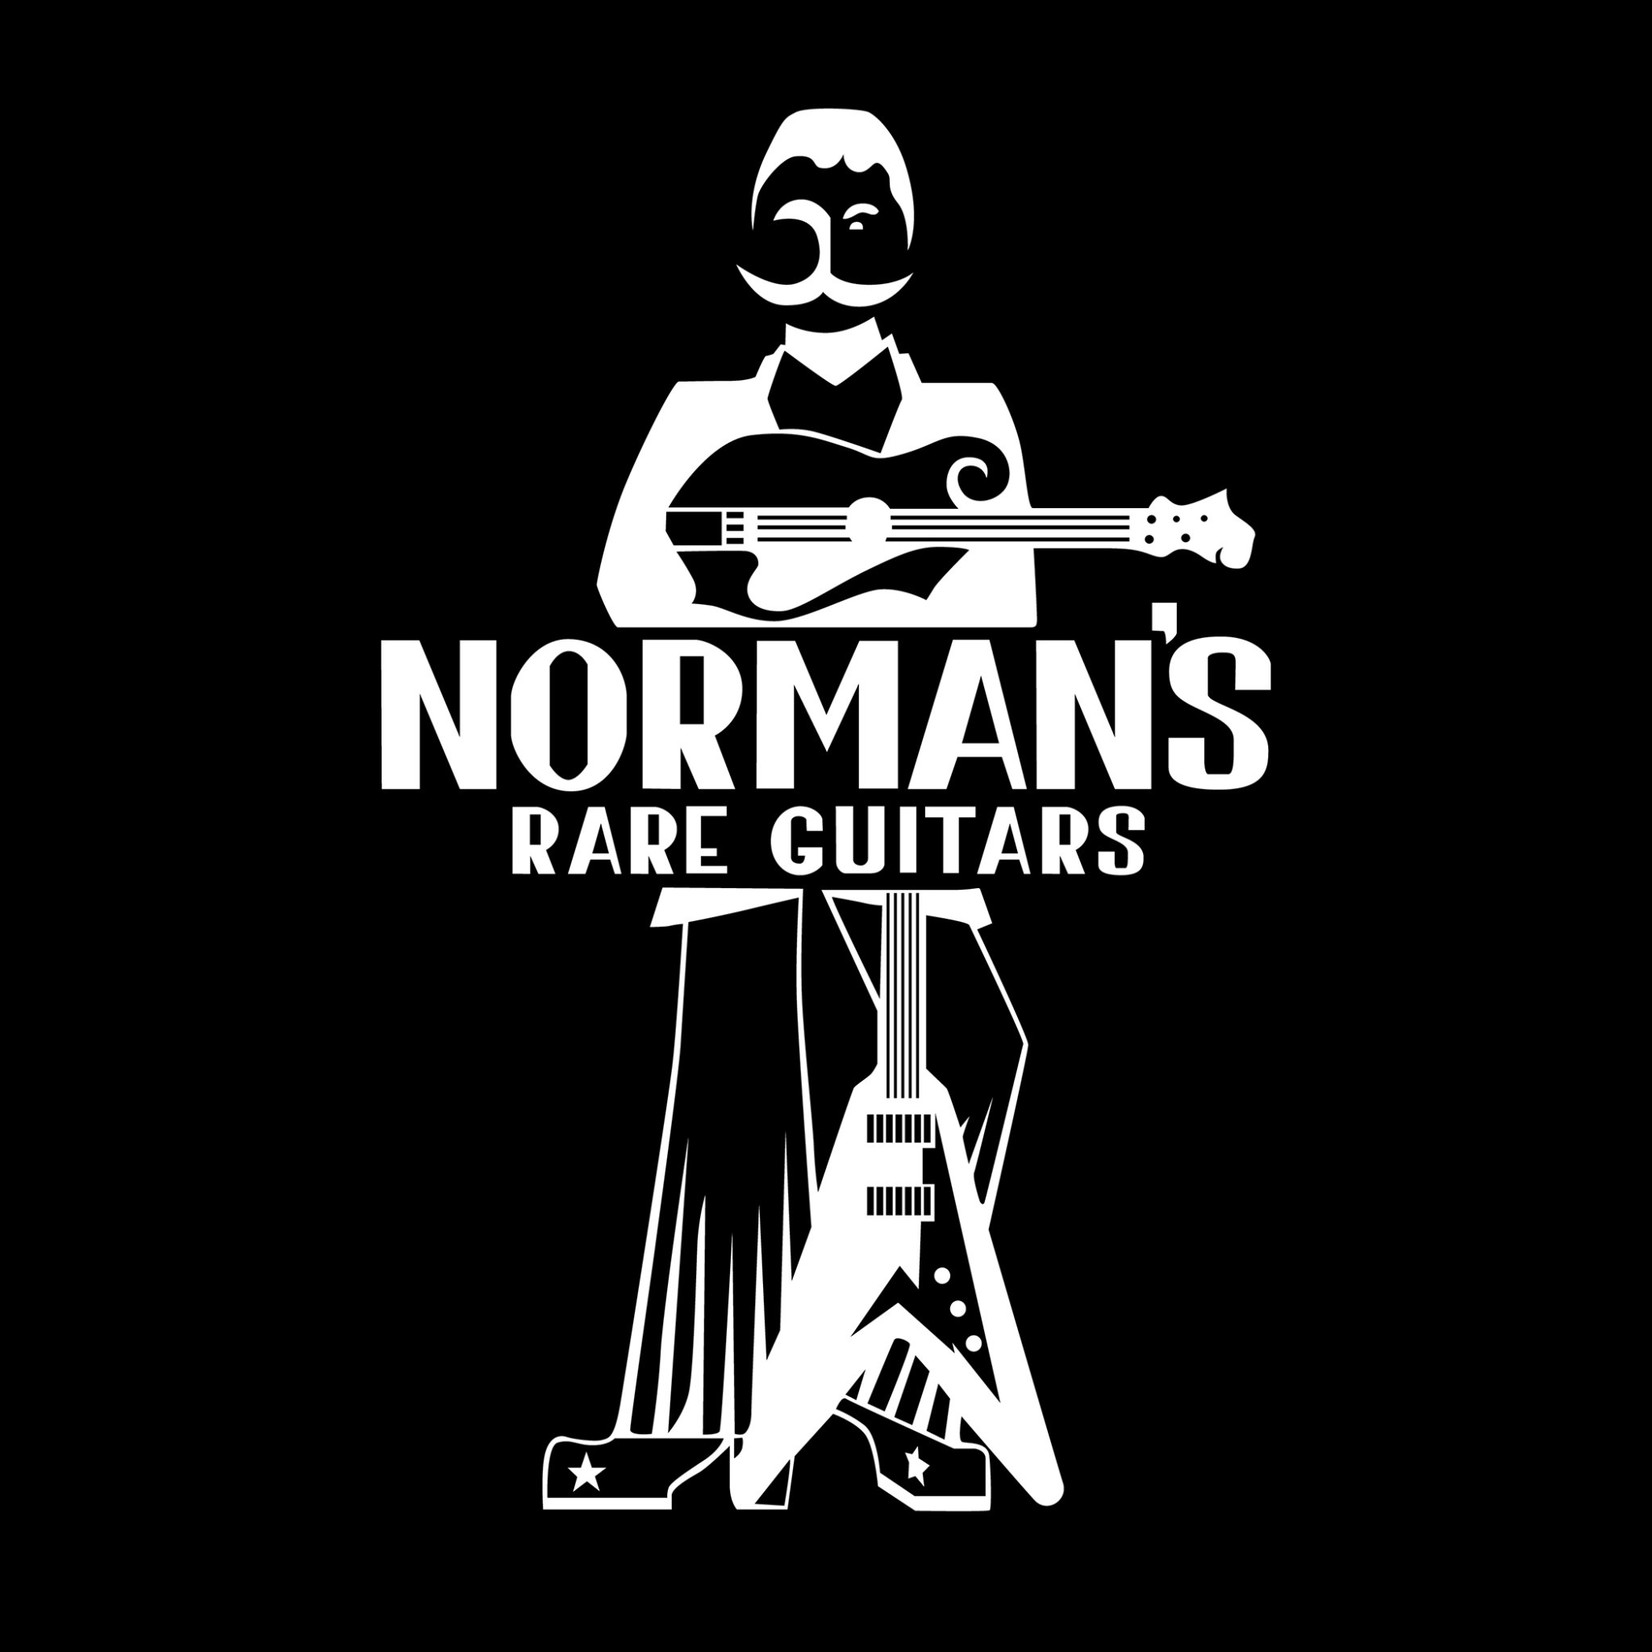 Norman's Rare Guitars Norman's Rare Guitars Logo